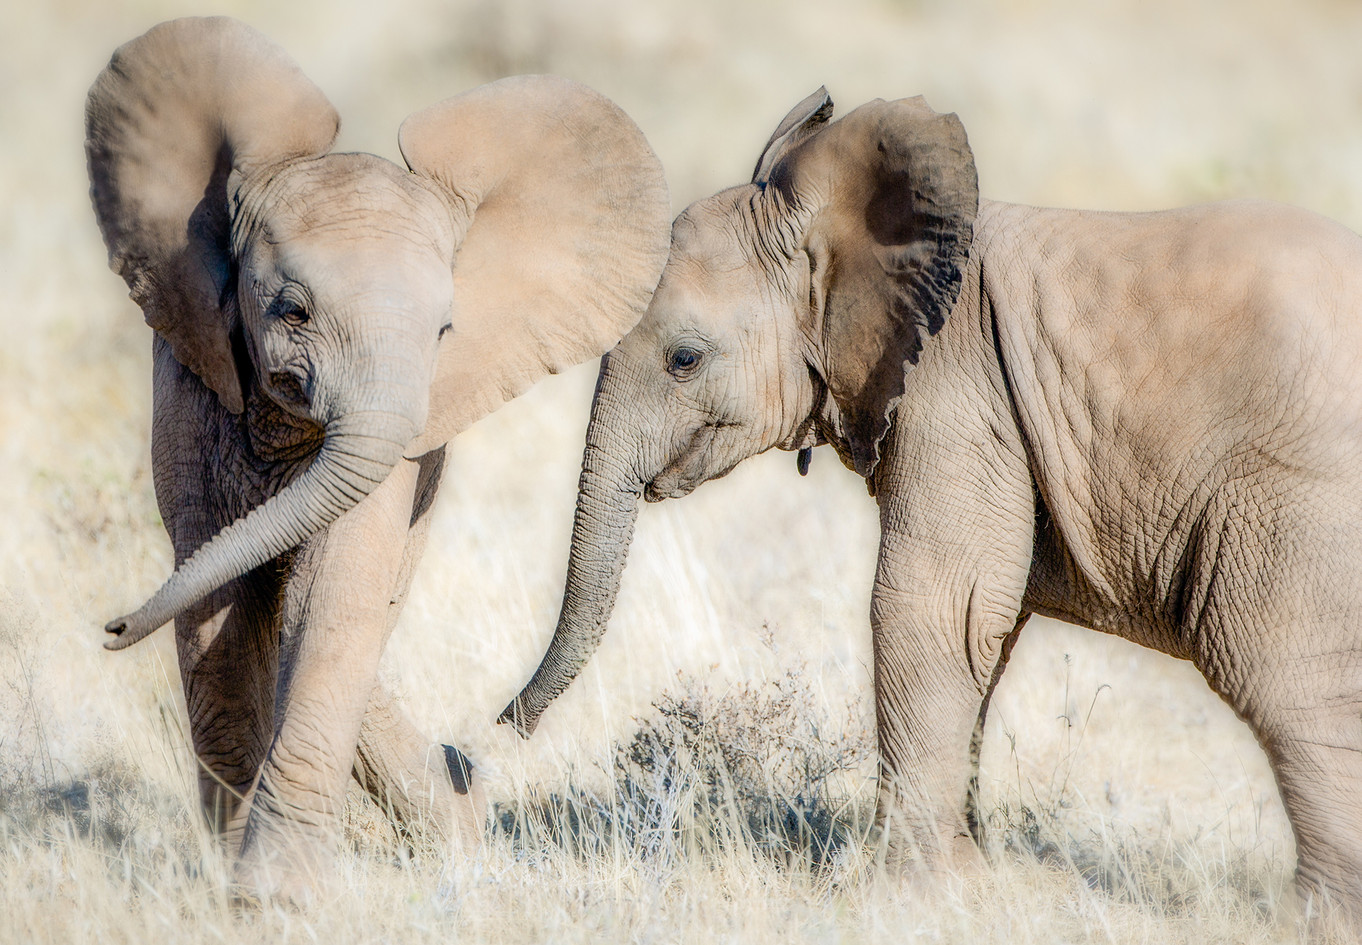 Elephant 28